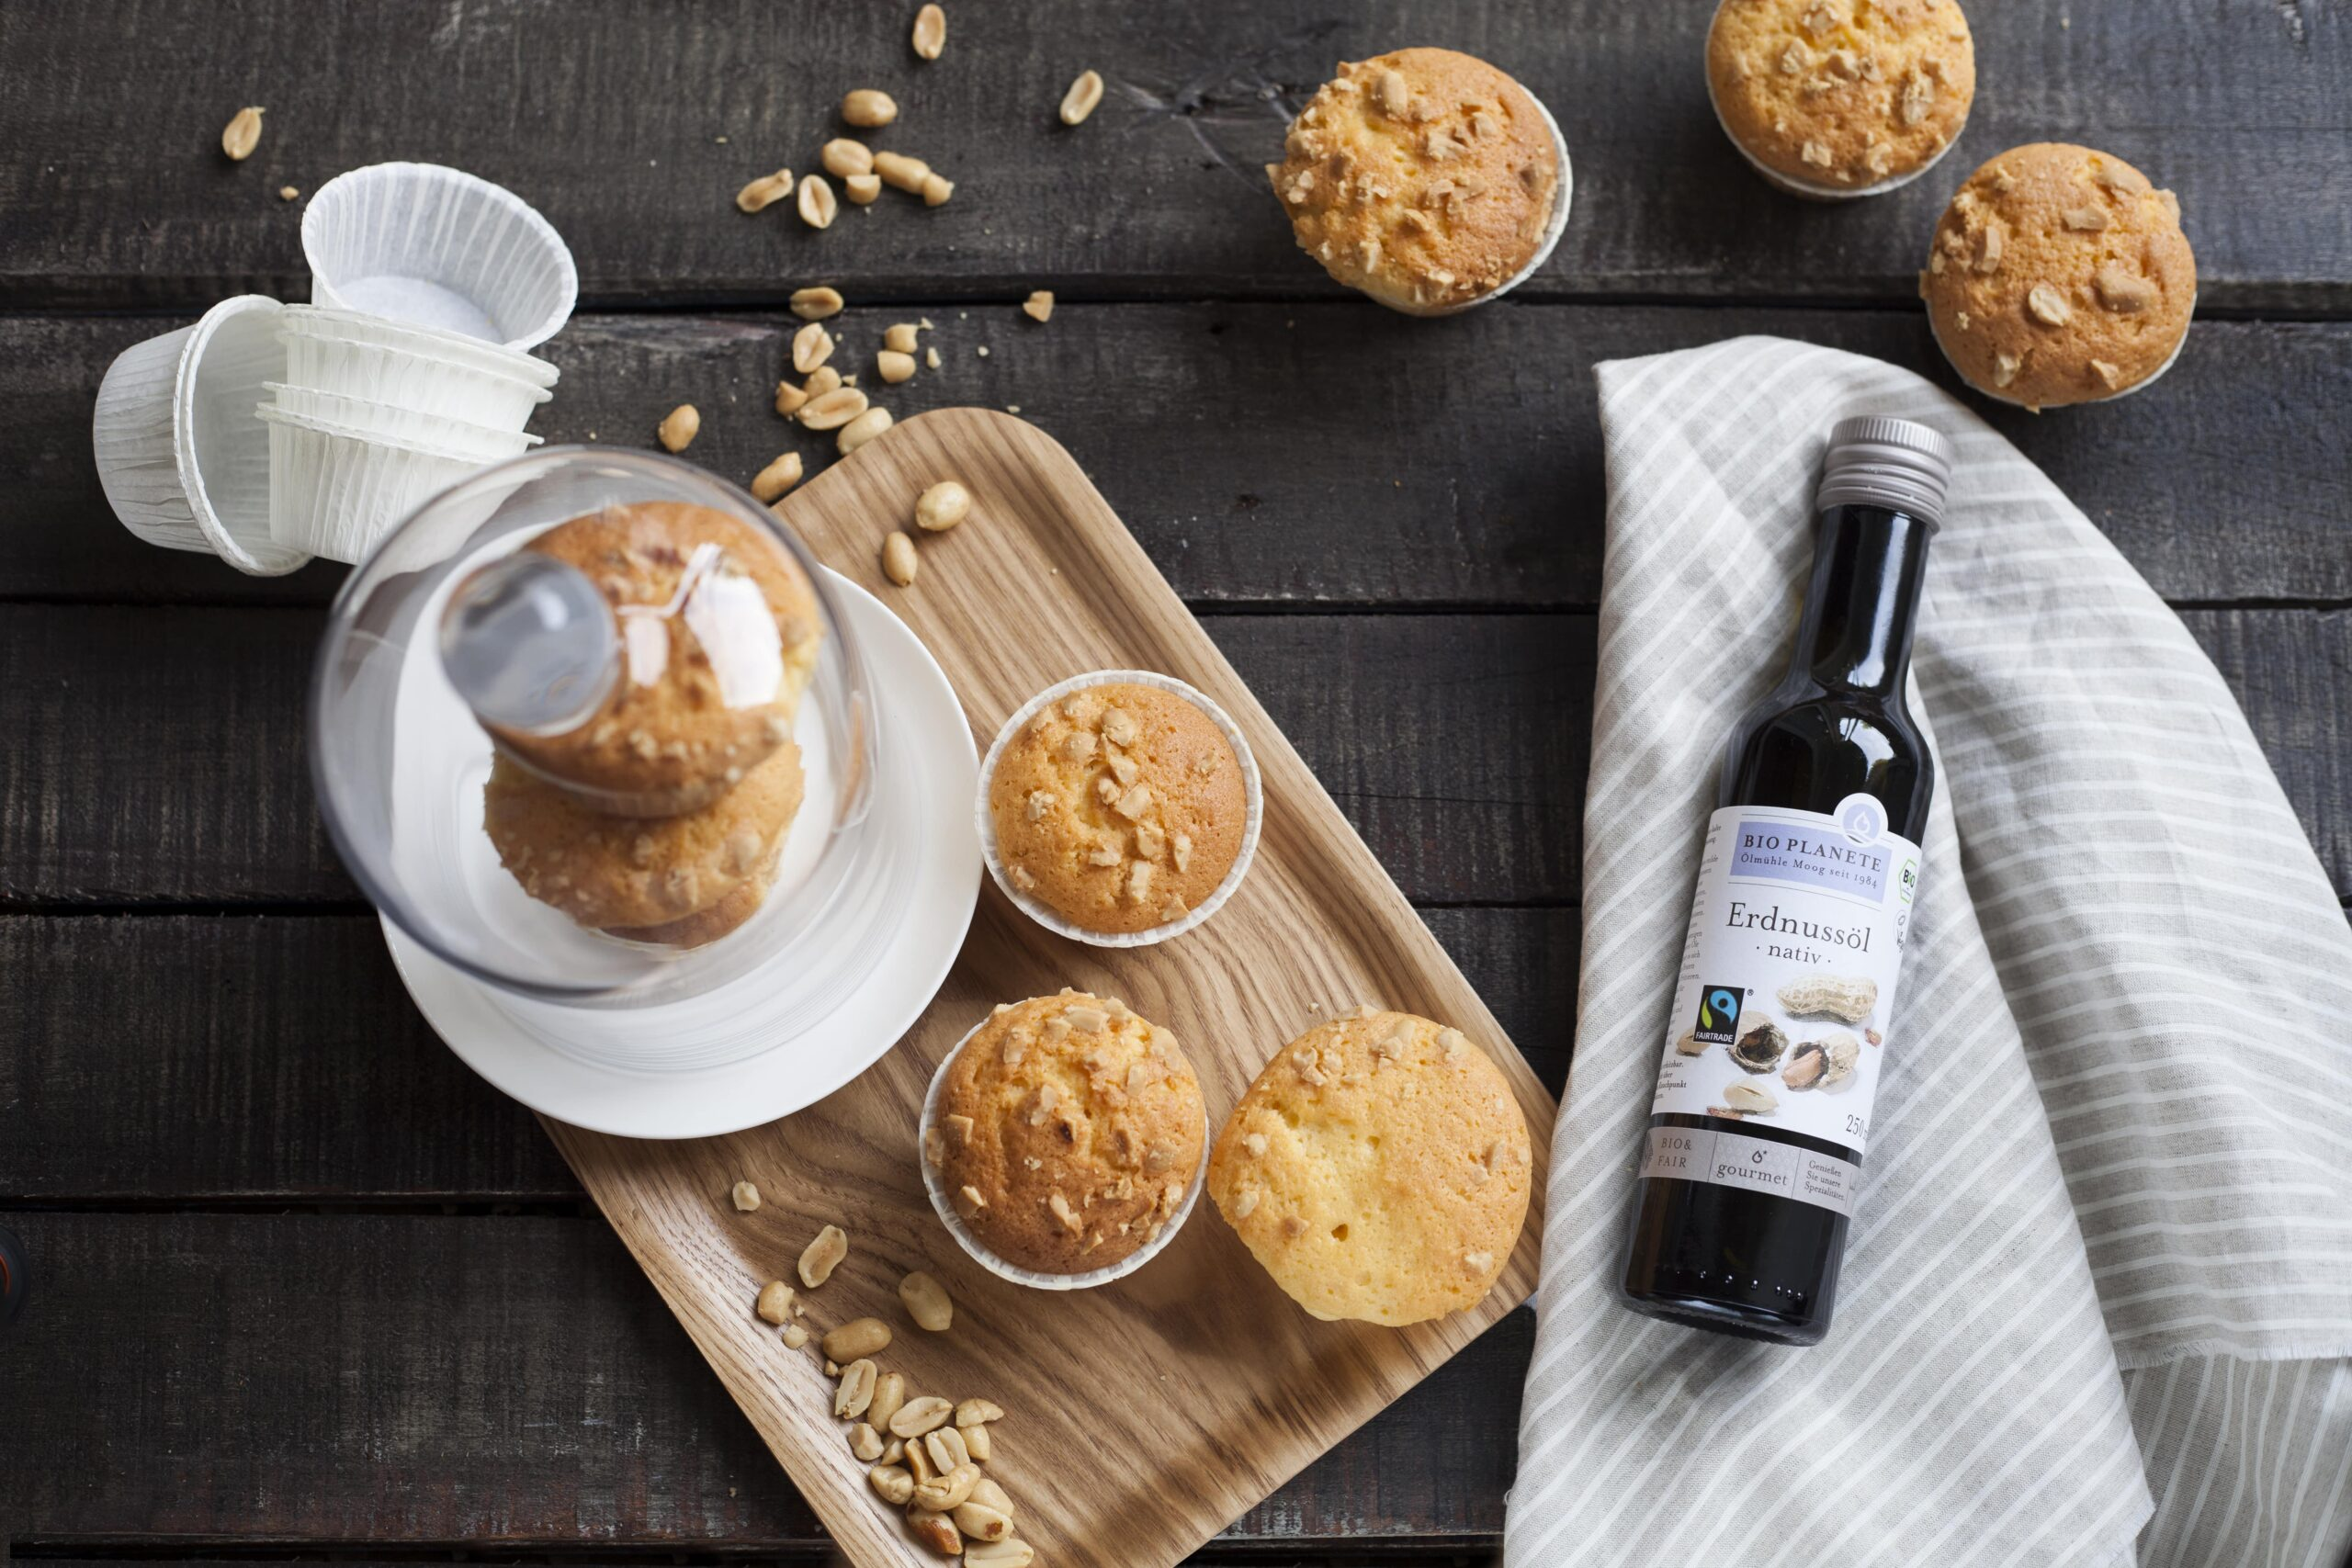 Peanut muffins